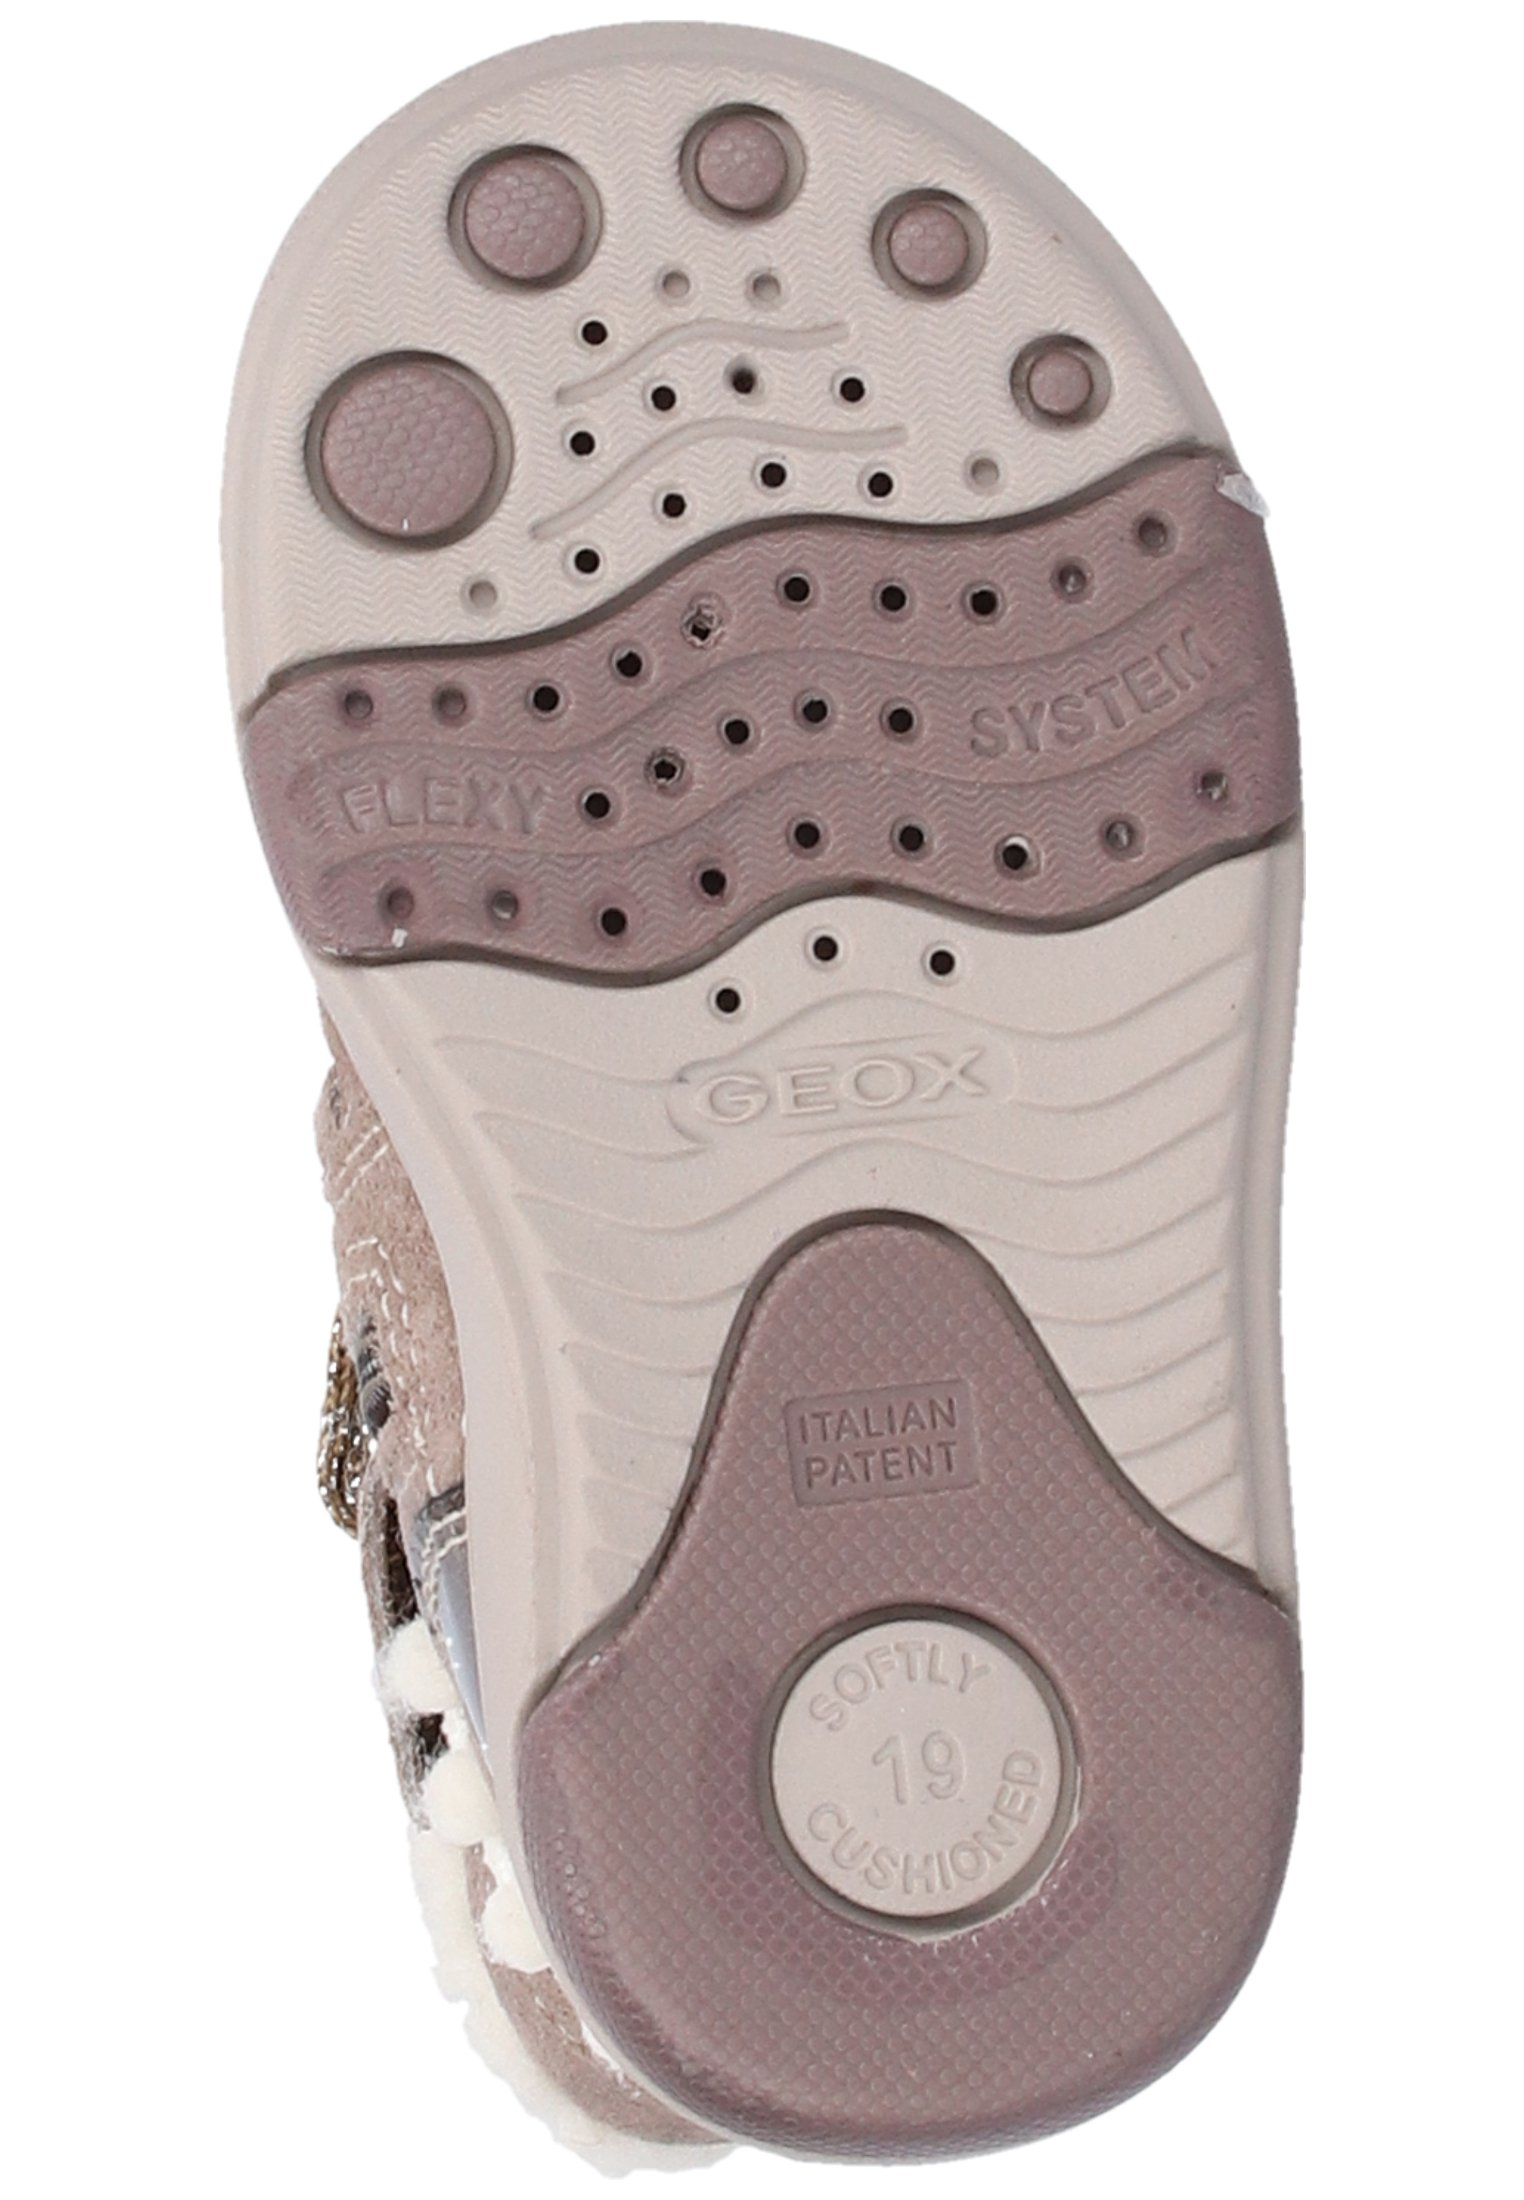 100% authentique Meilleurs prix Geox Chaussures premiers pas smoke grey 1Mw3j